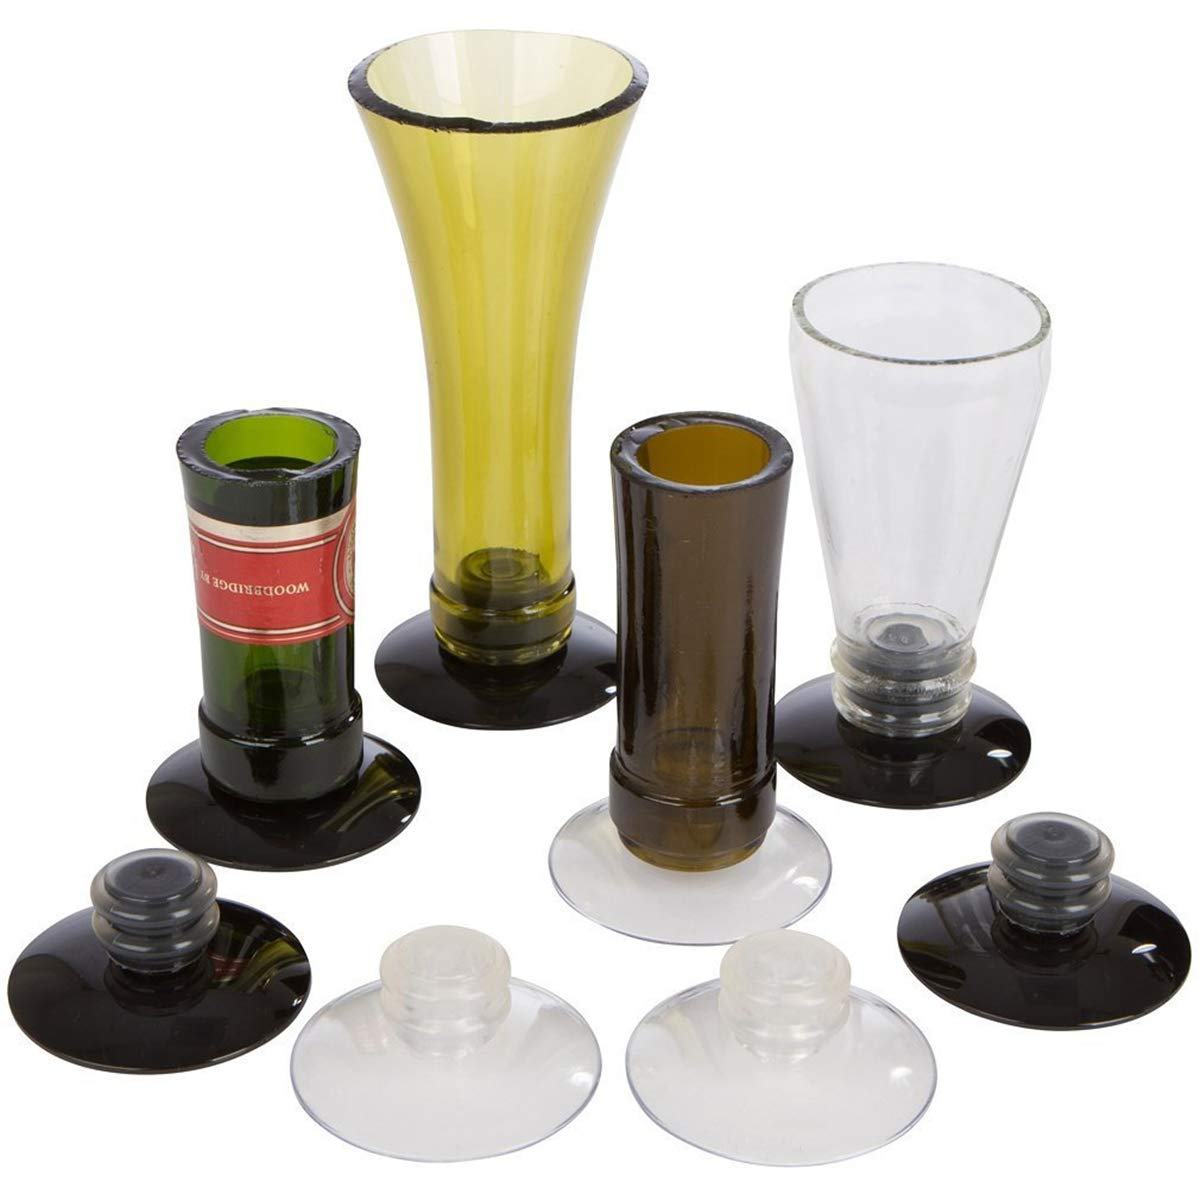 DIY Terrarium Wine Beer Glass Bottle Cutter Kit Craft ...